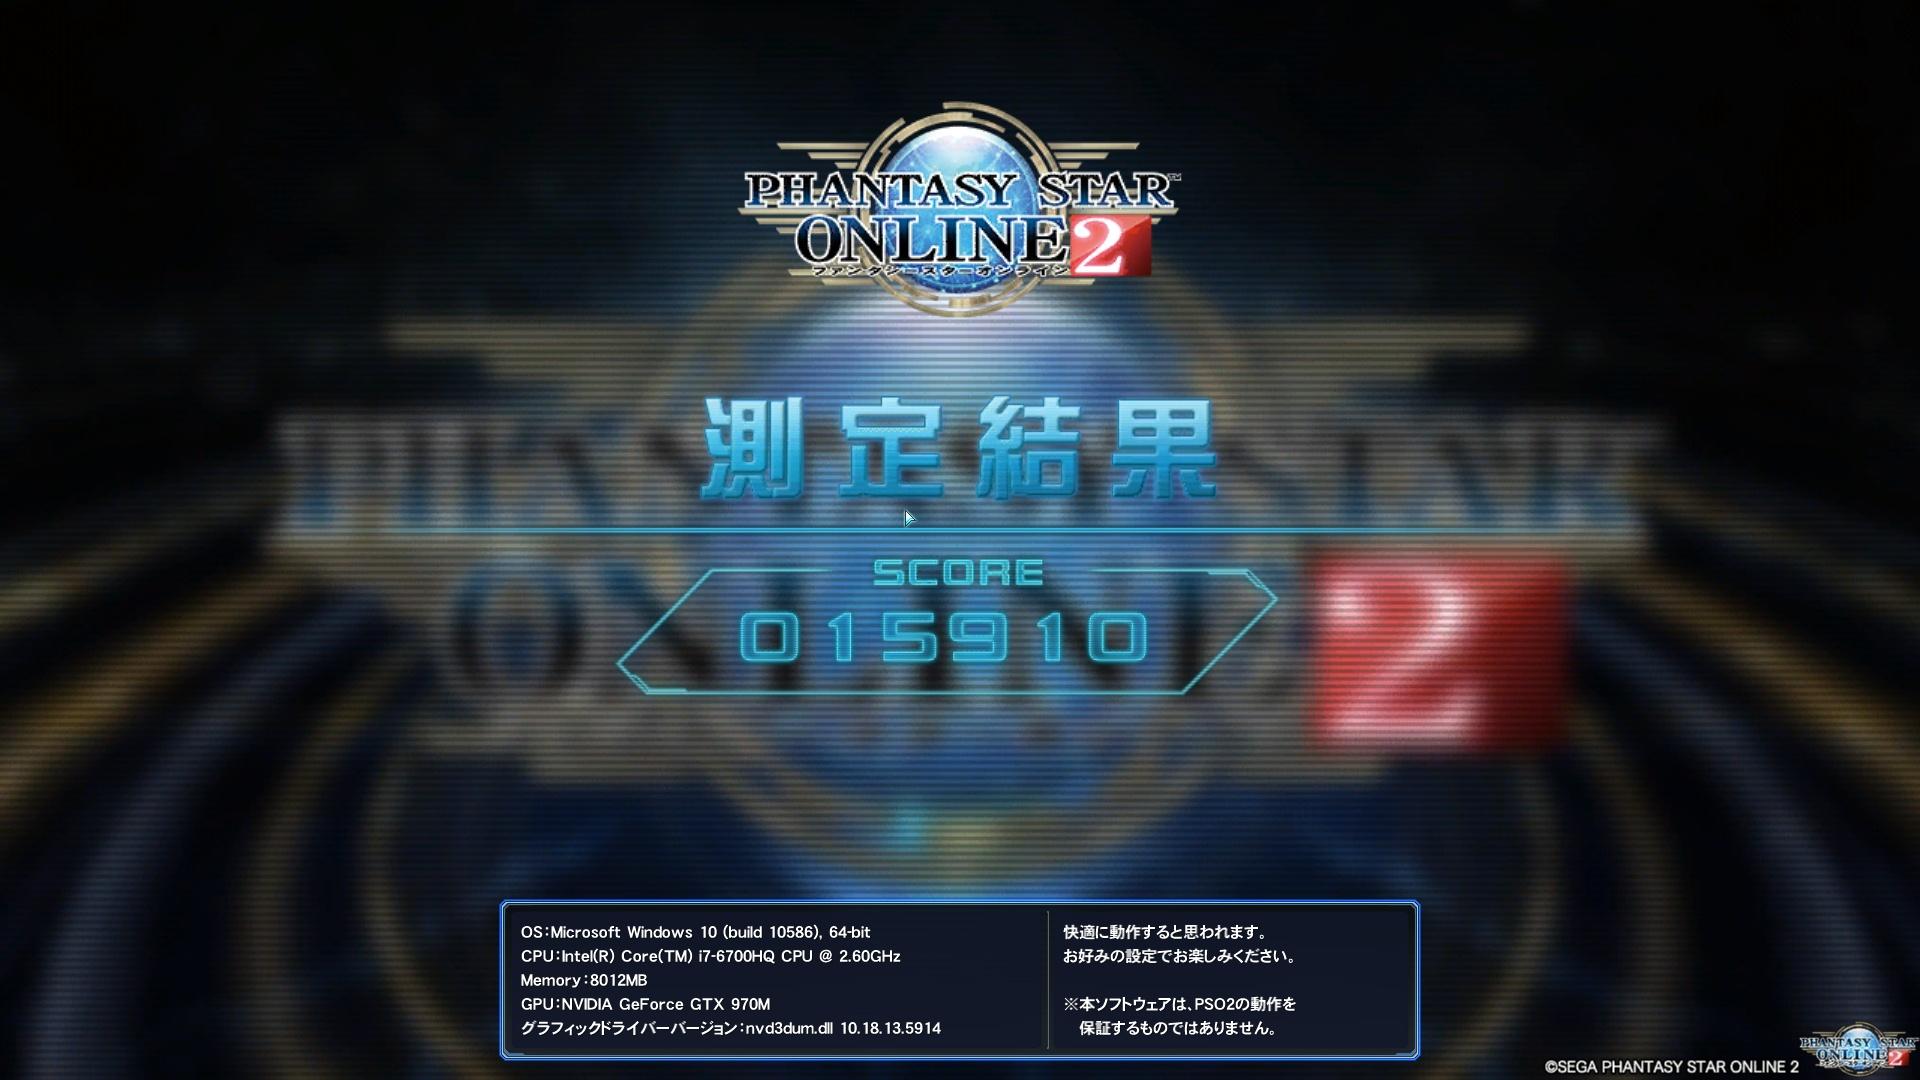 PSO2_GTX970M_160511.jpg